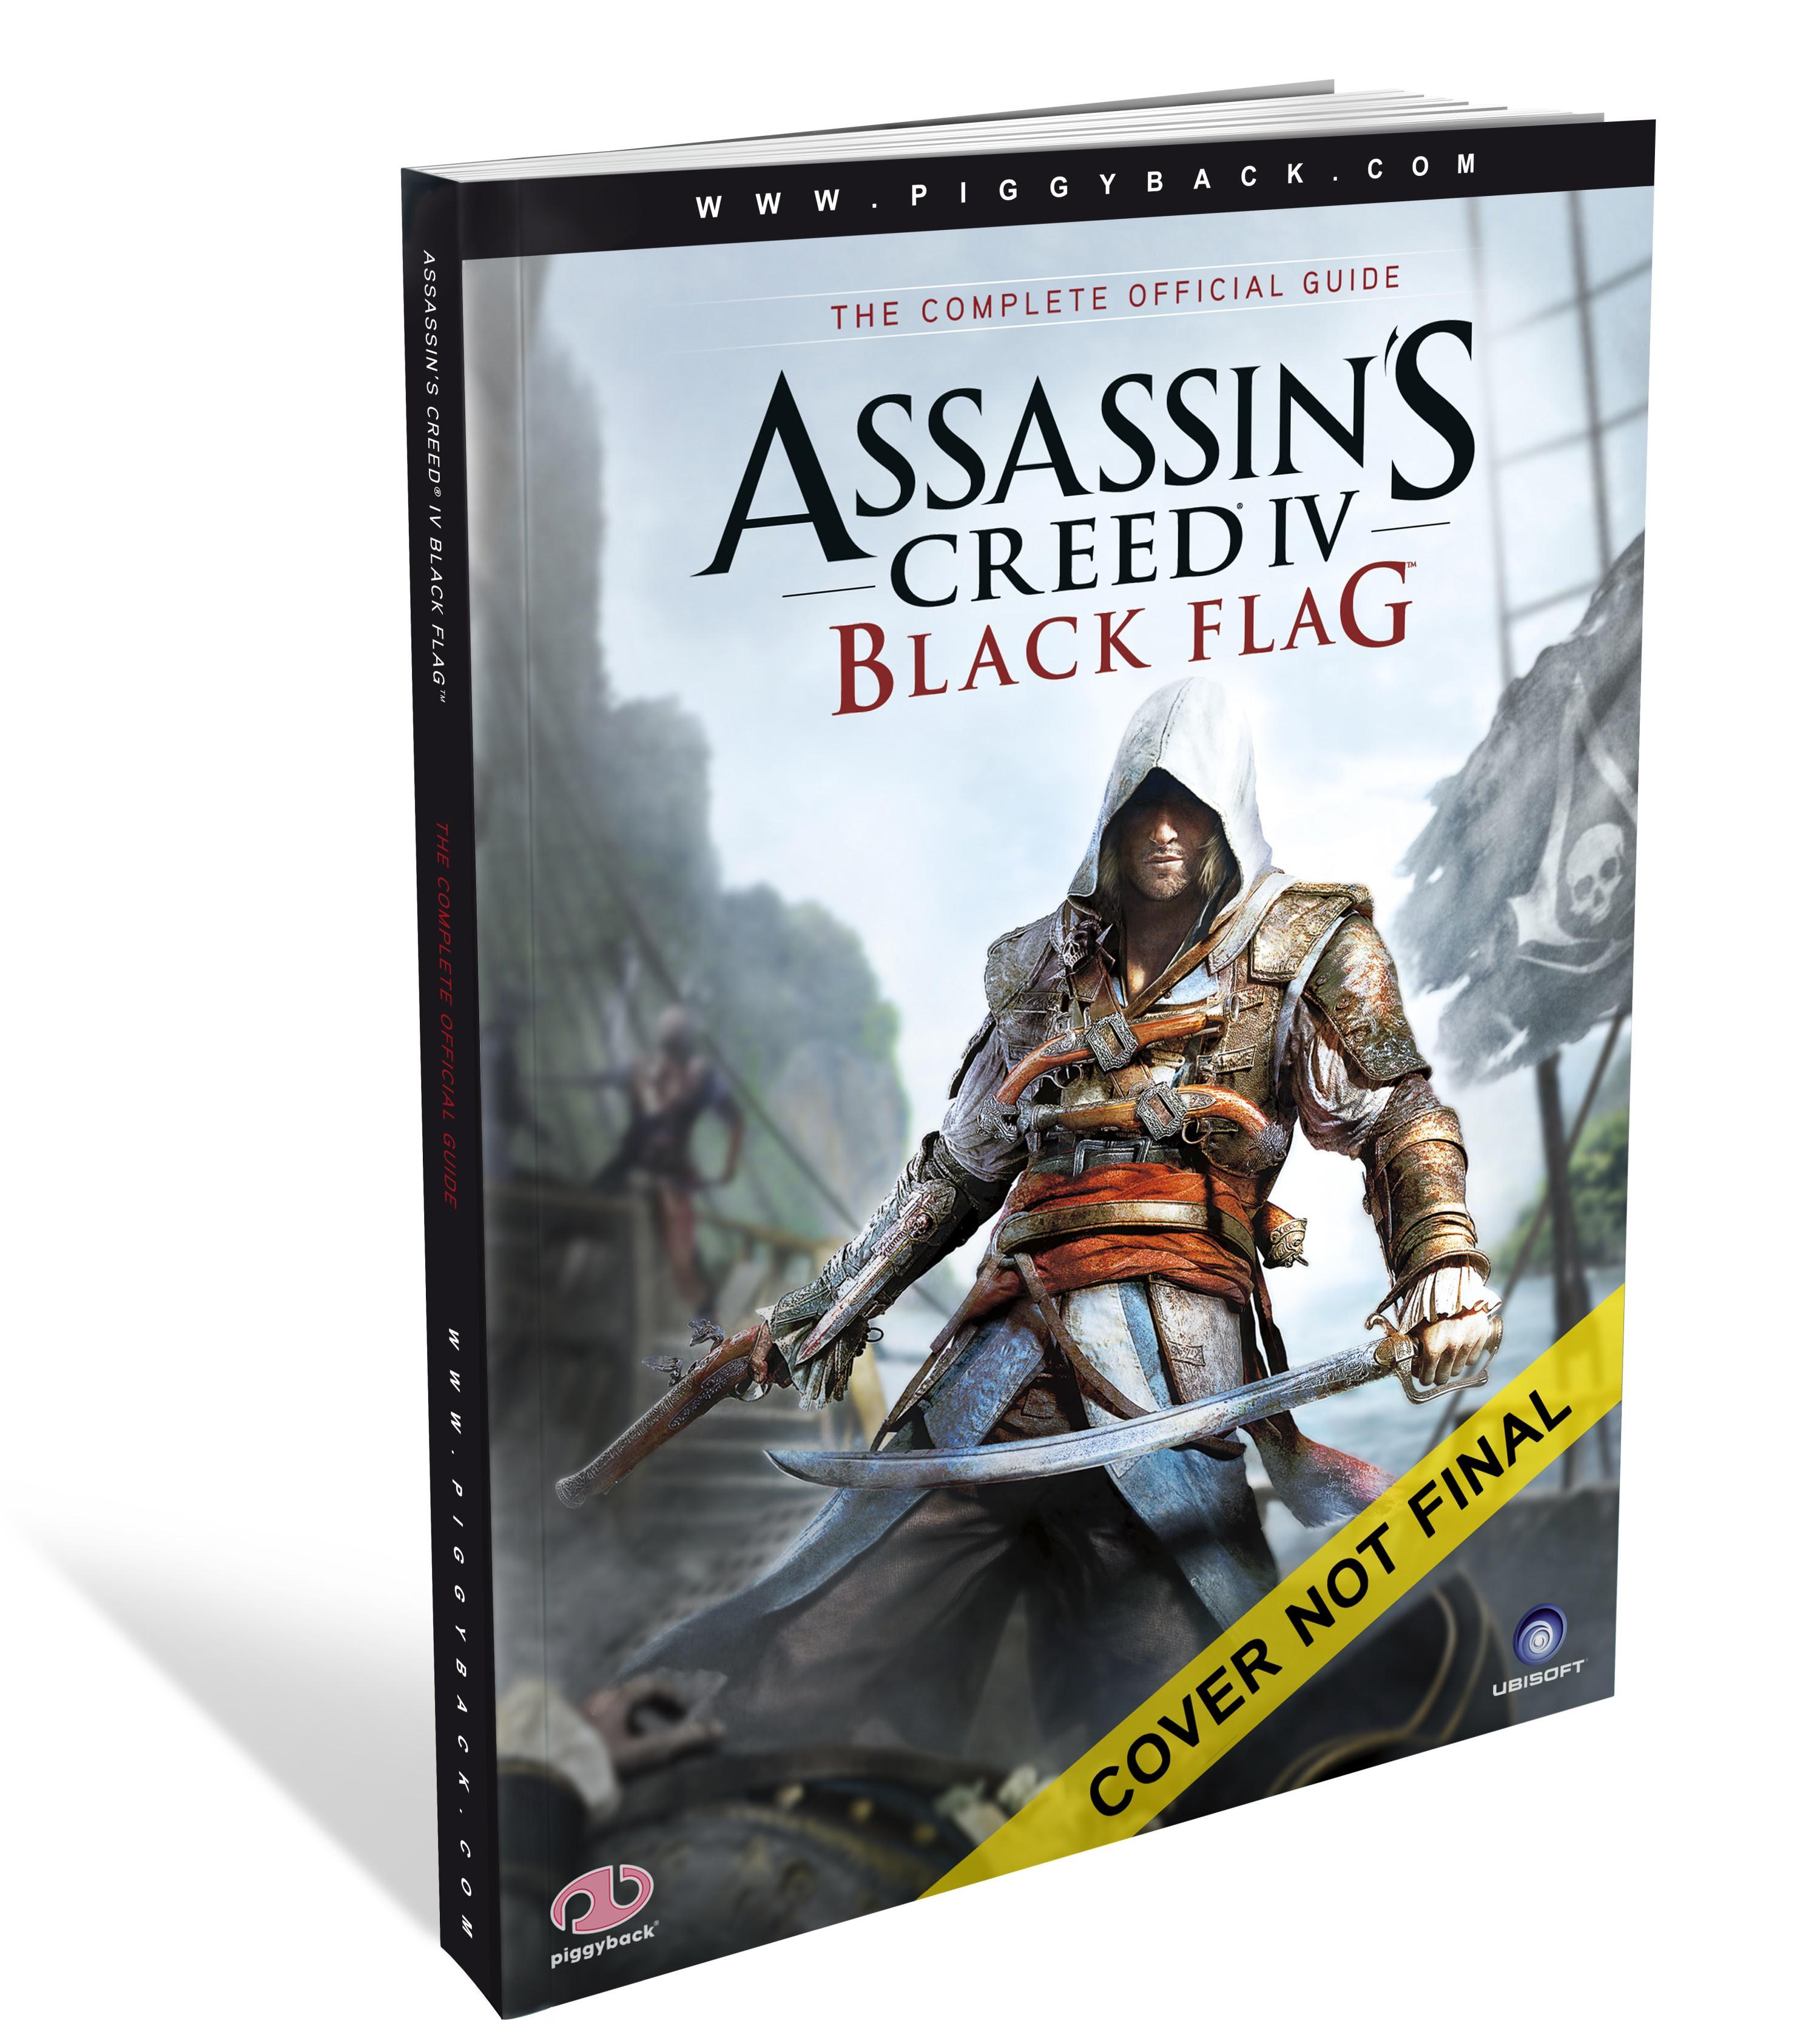 New Assassin S Creed Iv Books Announced Brutal Gamer